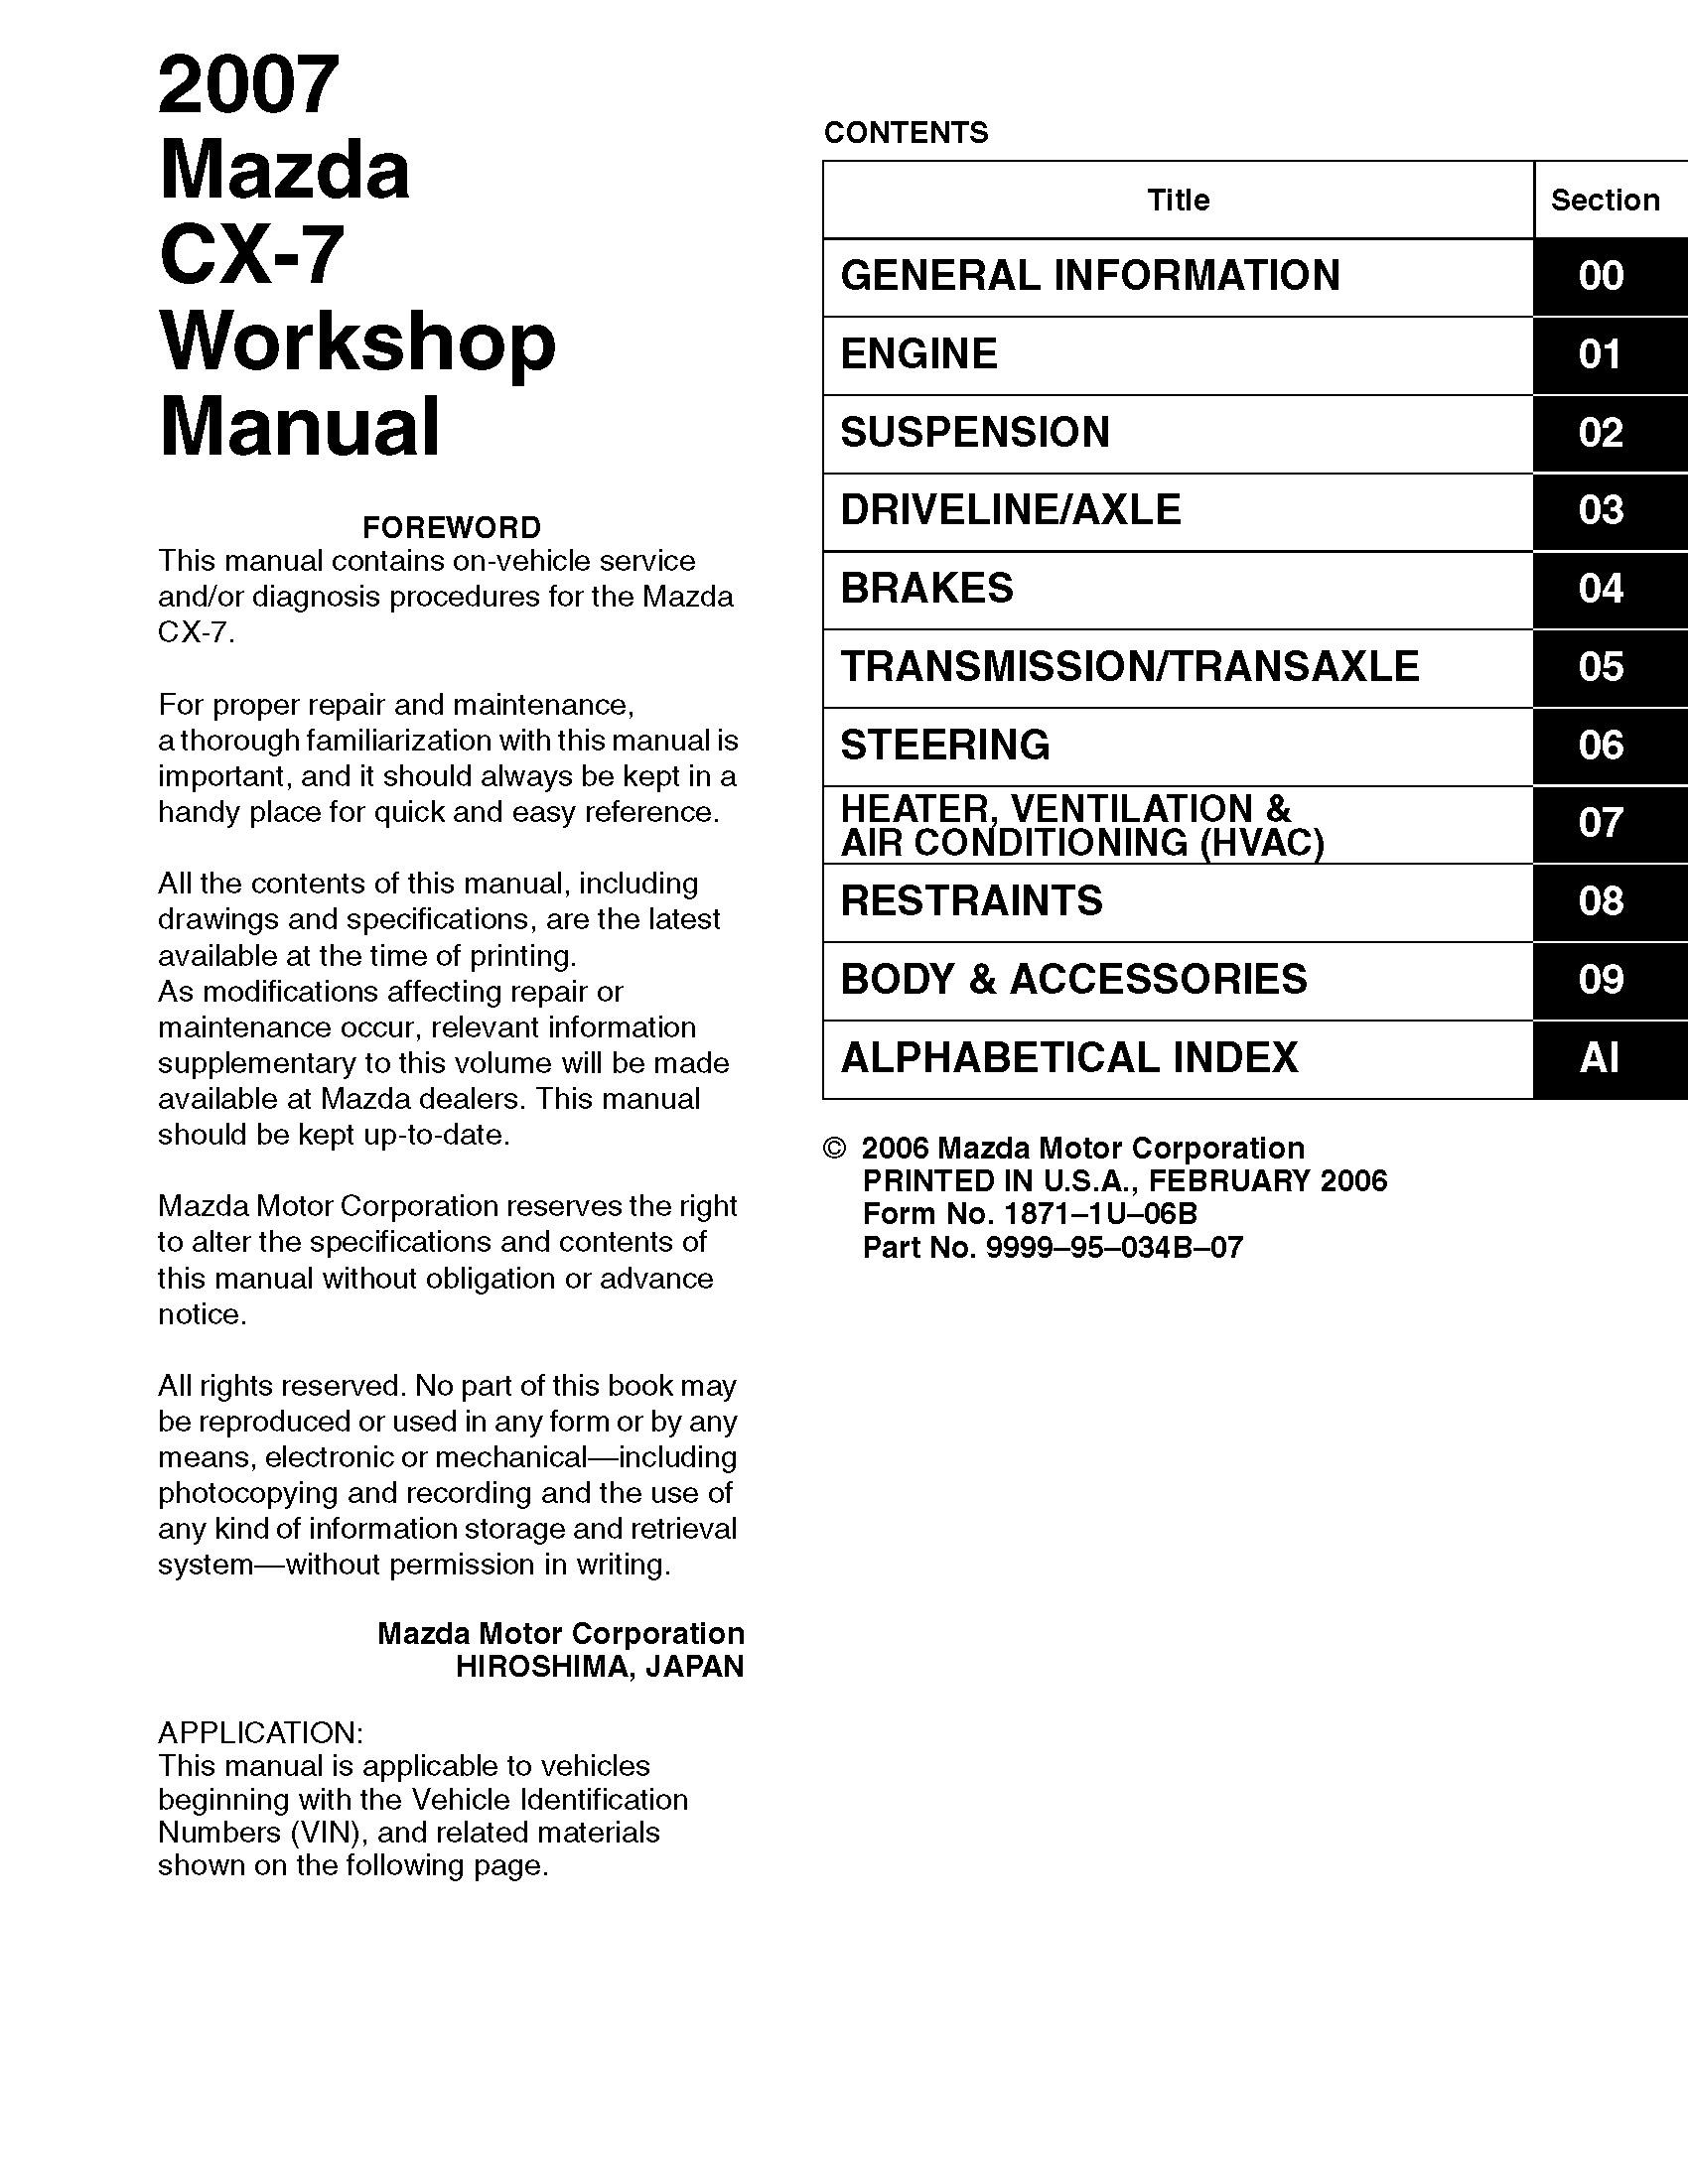 2007 mazda cx 7 oem workshop service and repair manual rh sellfy com CX -5 Mazda 2007 Mazda CX-9